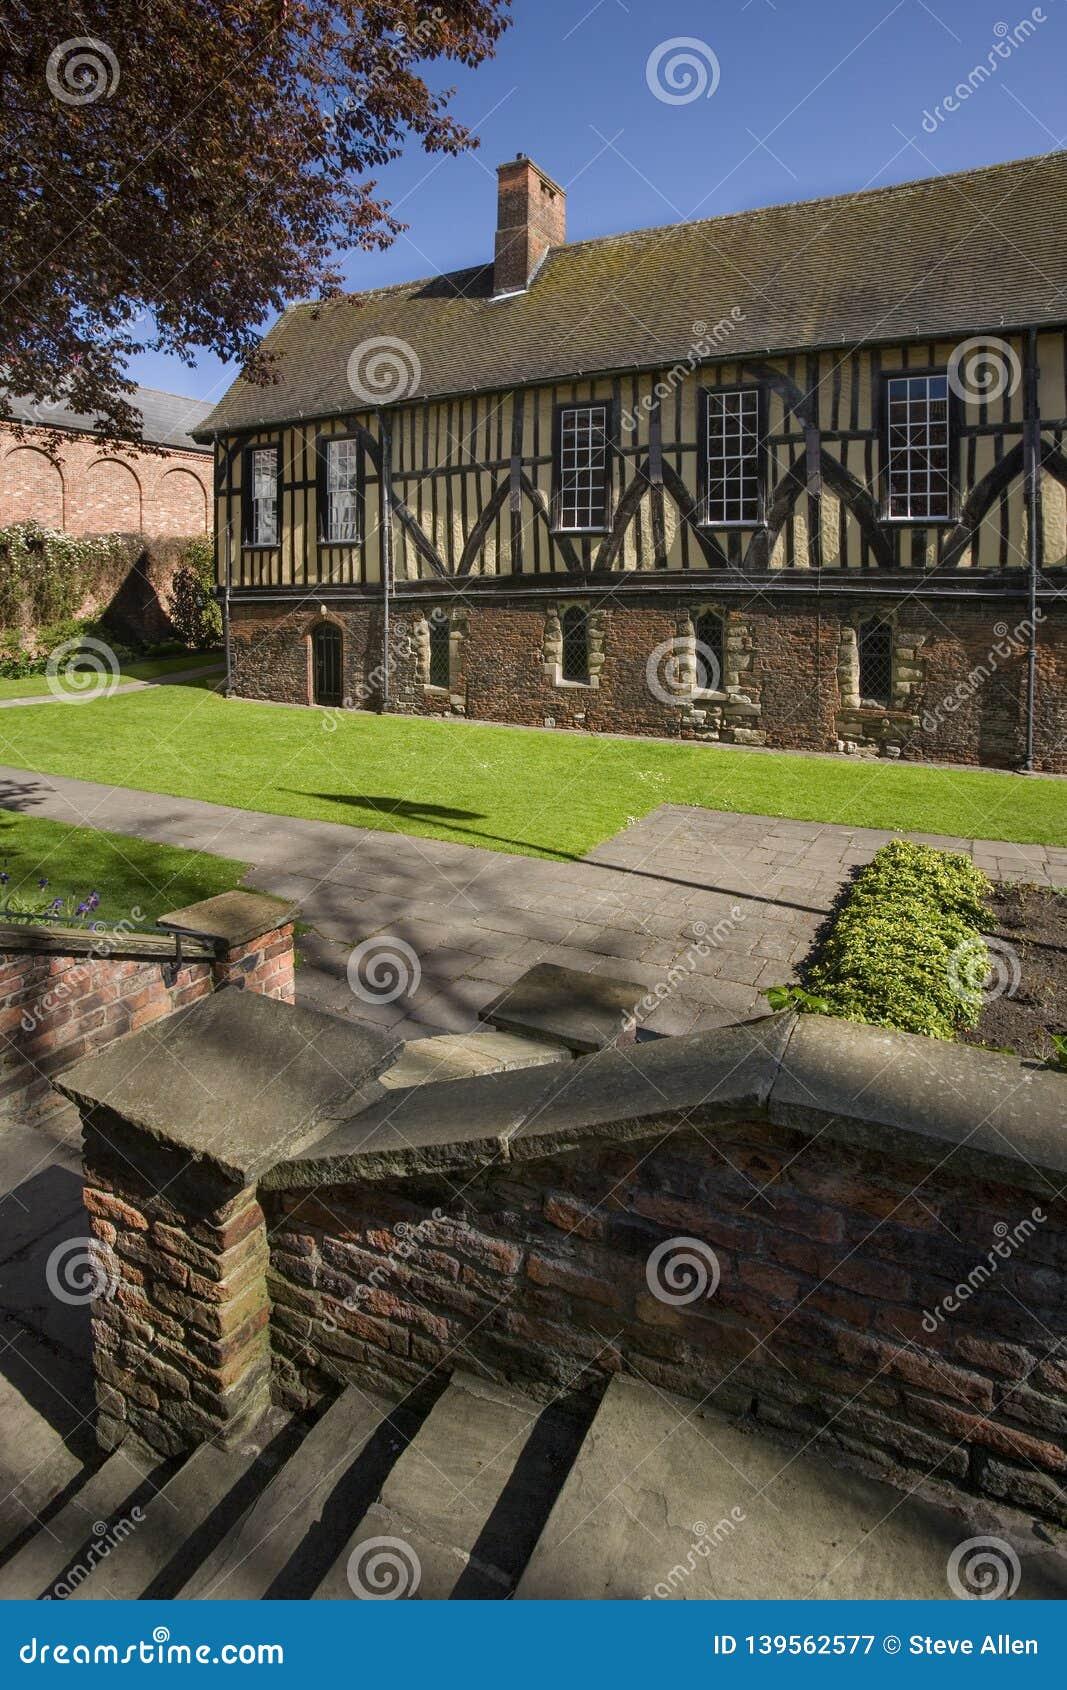 The Merchant Adventurers Guild Hall in York - England